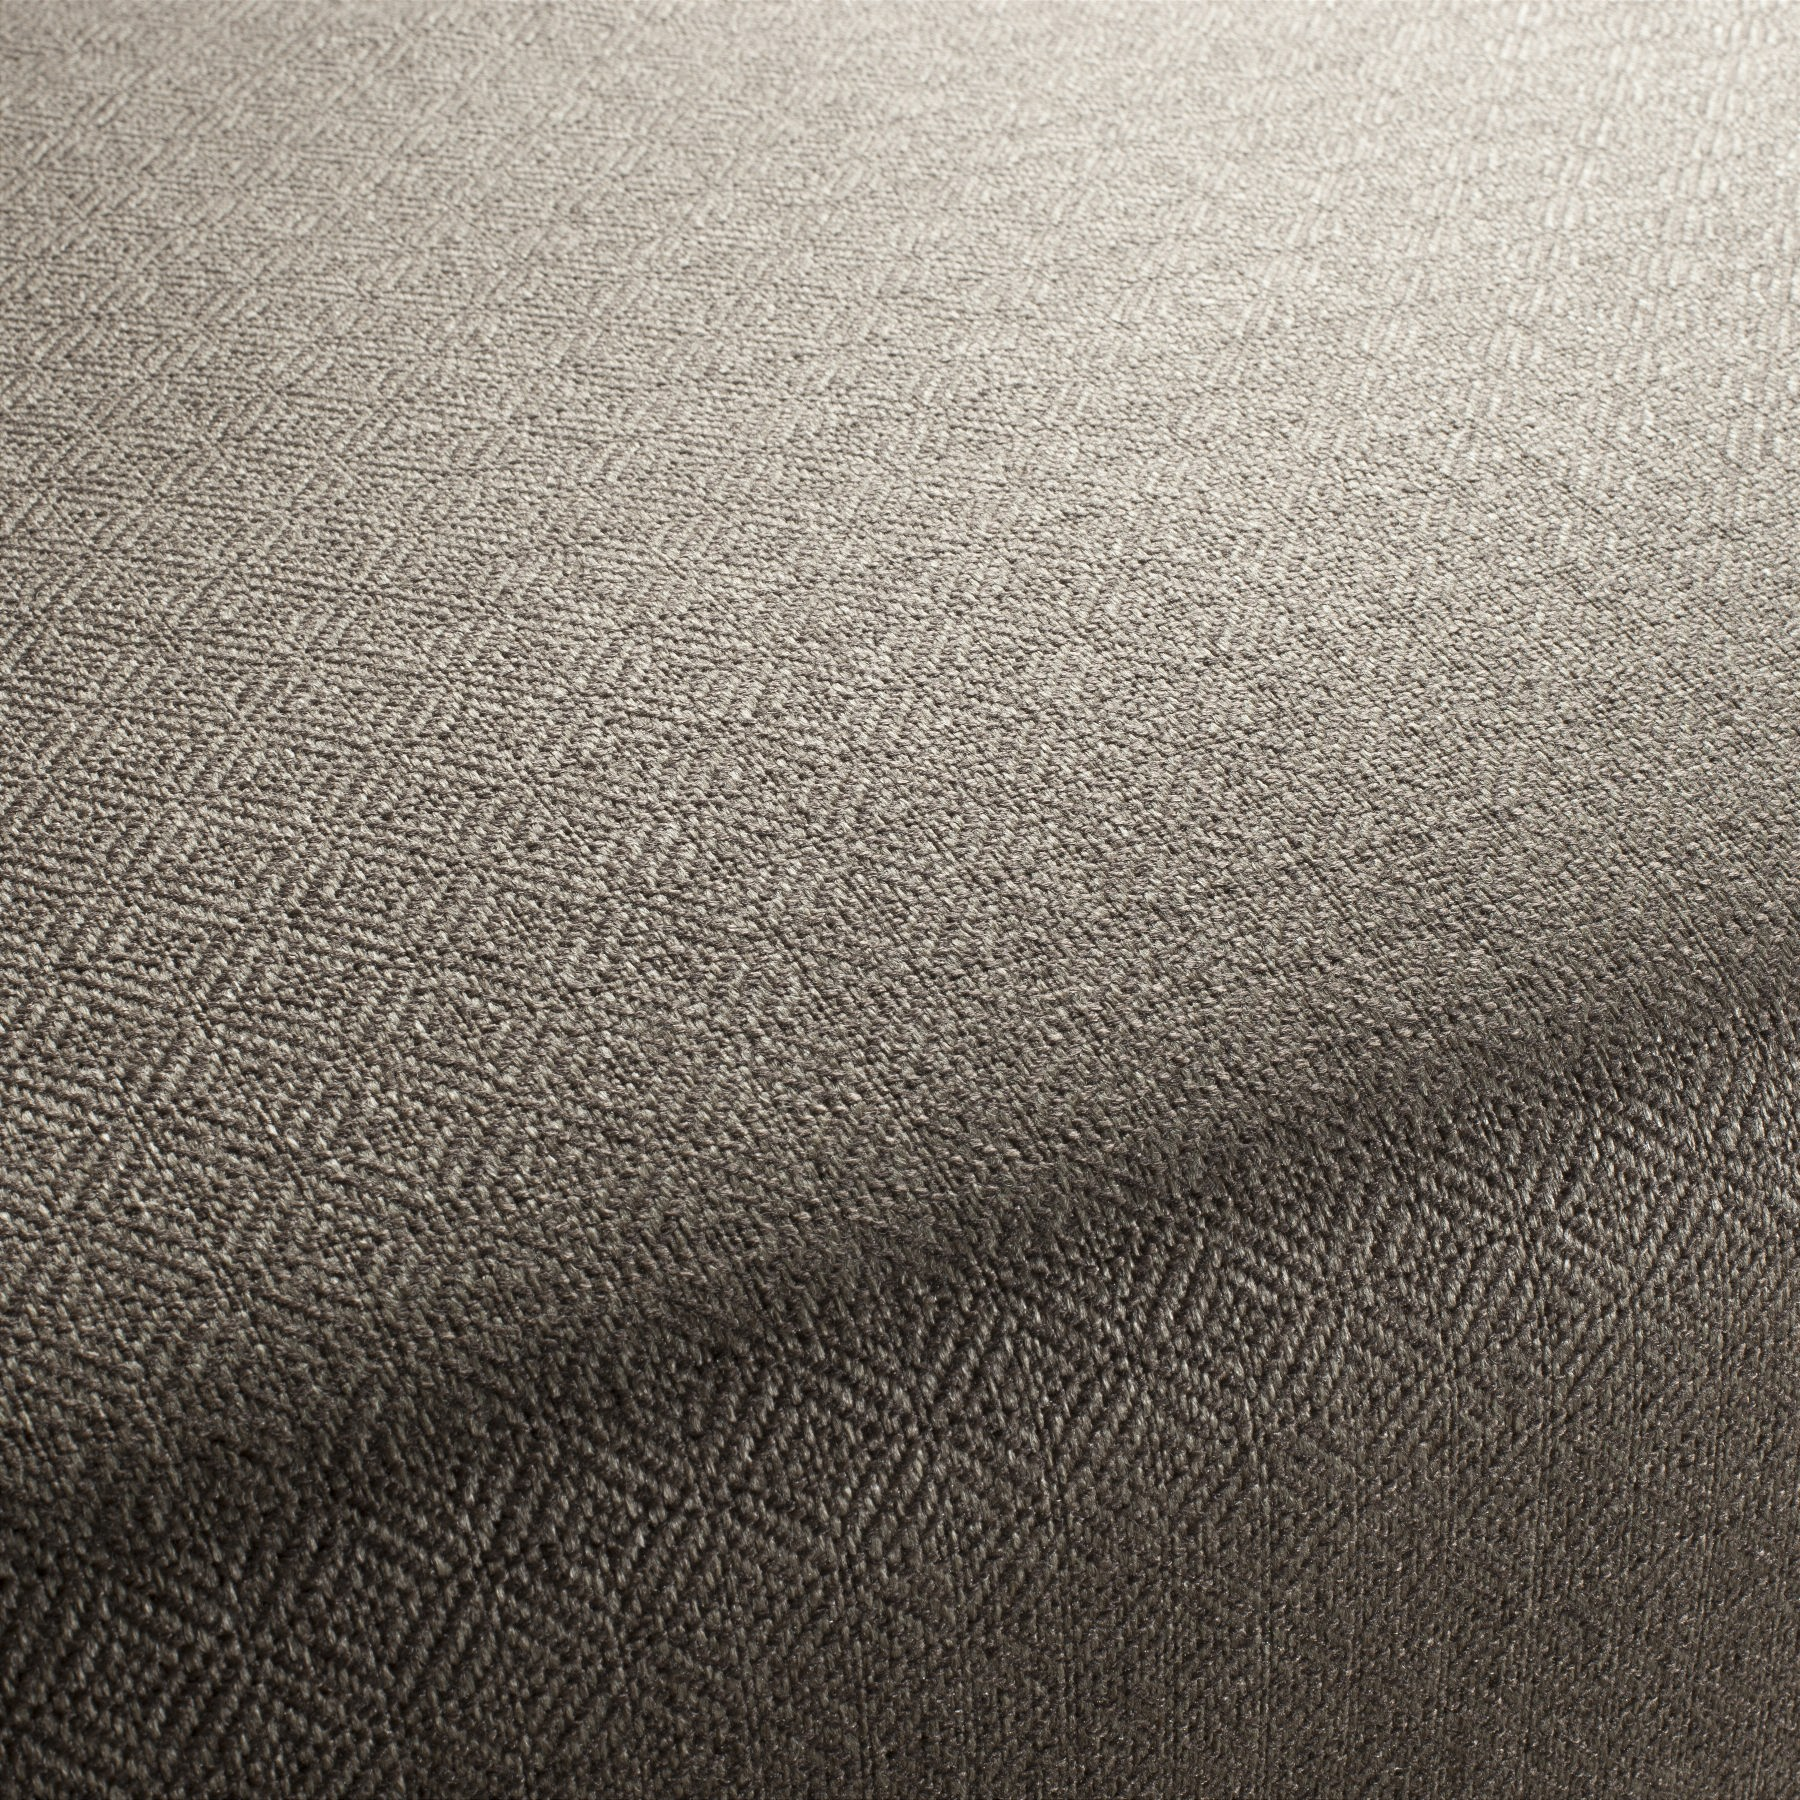 upholstery fabric curtis 9 2165 020 jab anstoetz. Black Bedroom Furniture Sets. Home Design Ideas